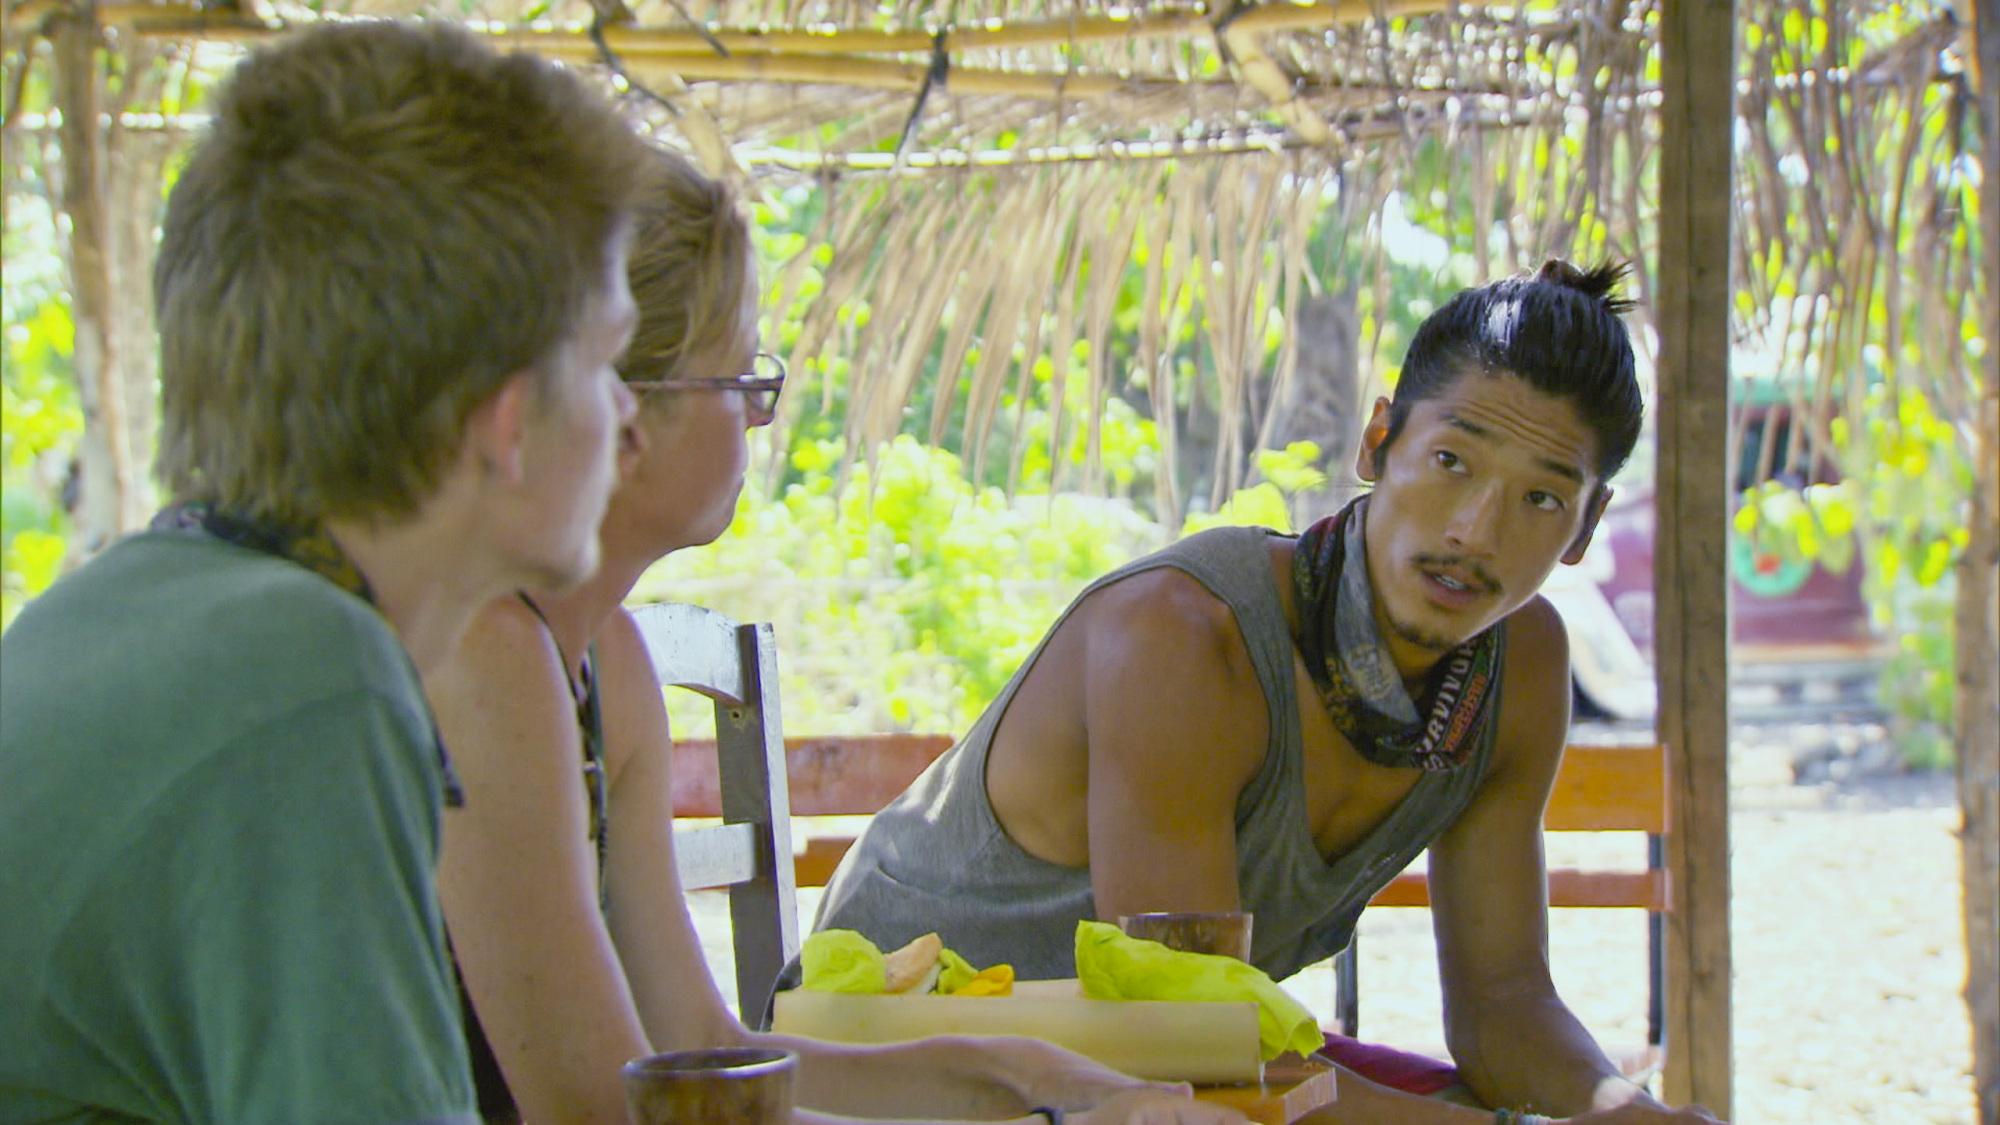 Chatting in Season 28 Episode 11